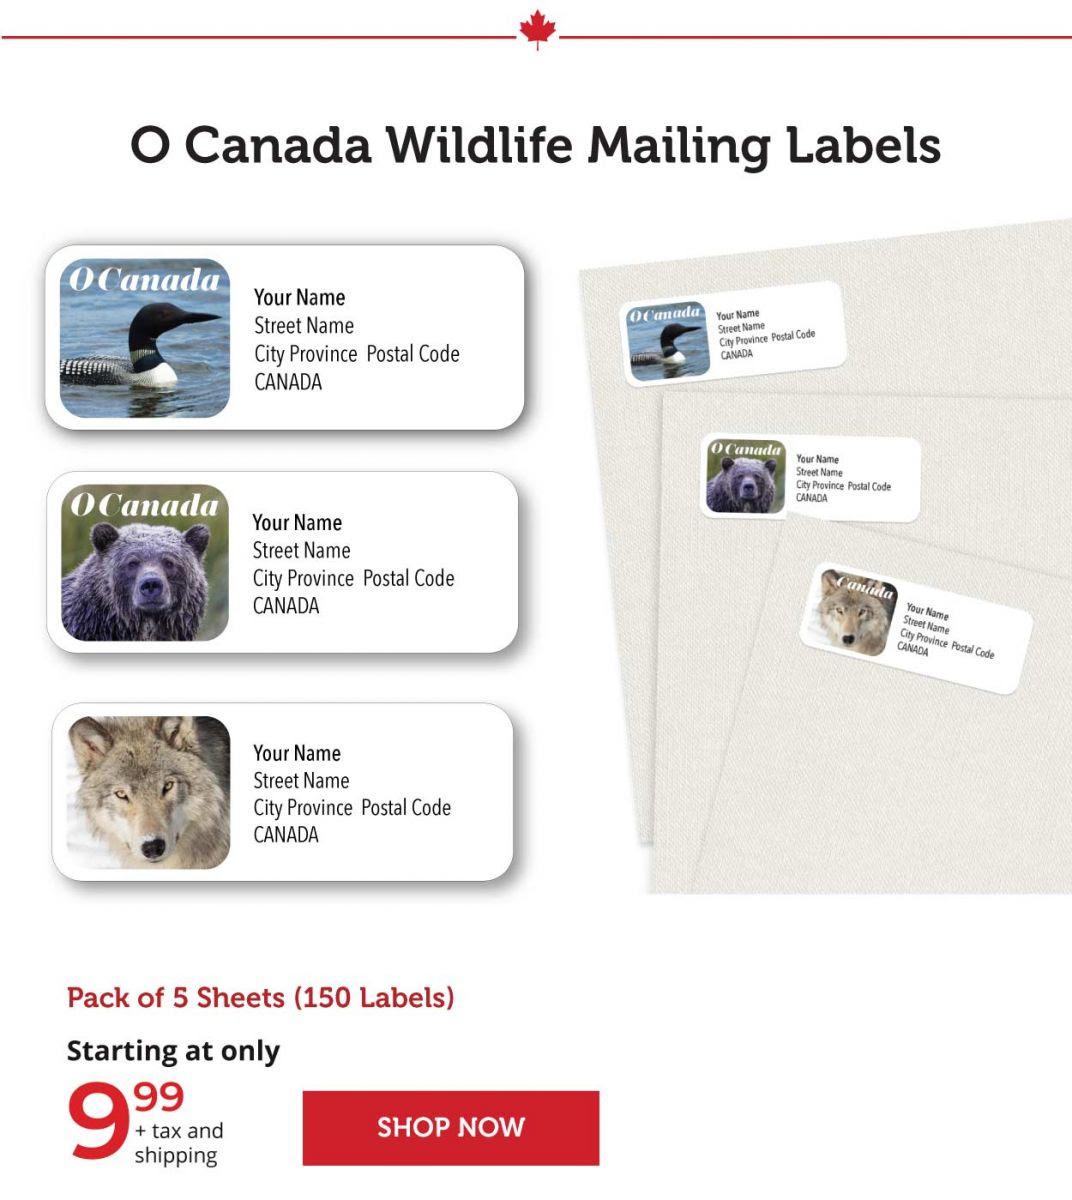 O Canada Wildlife Mailing Labels